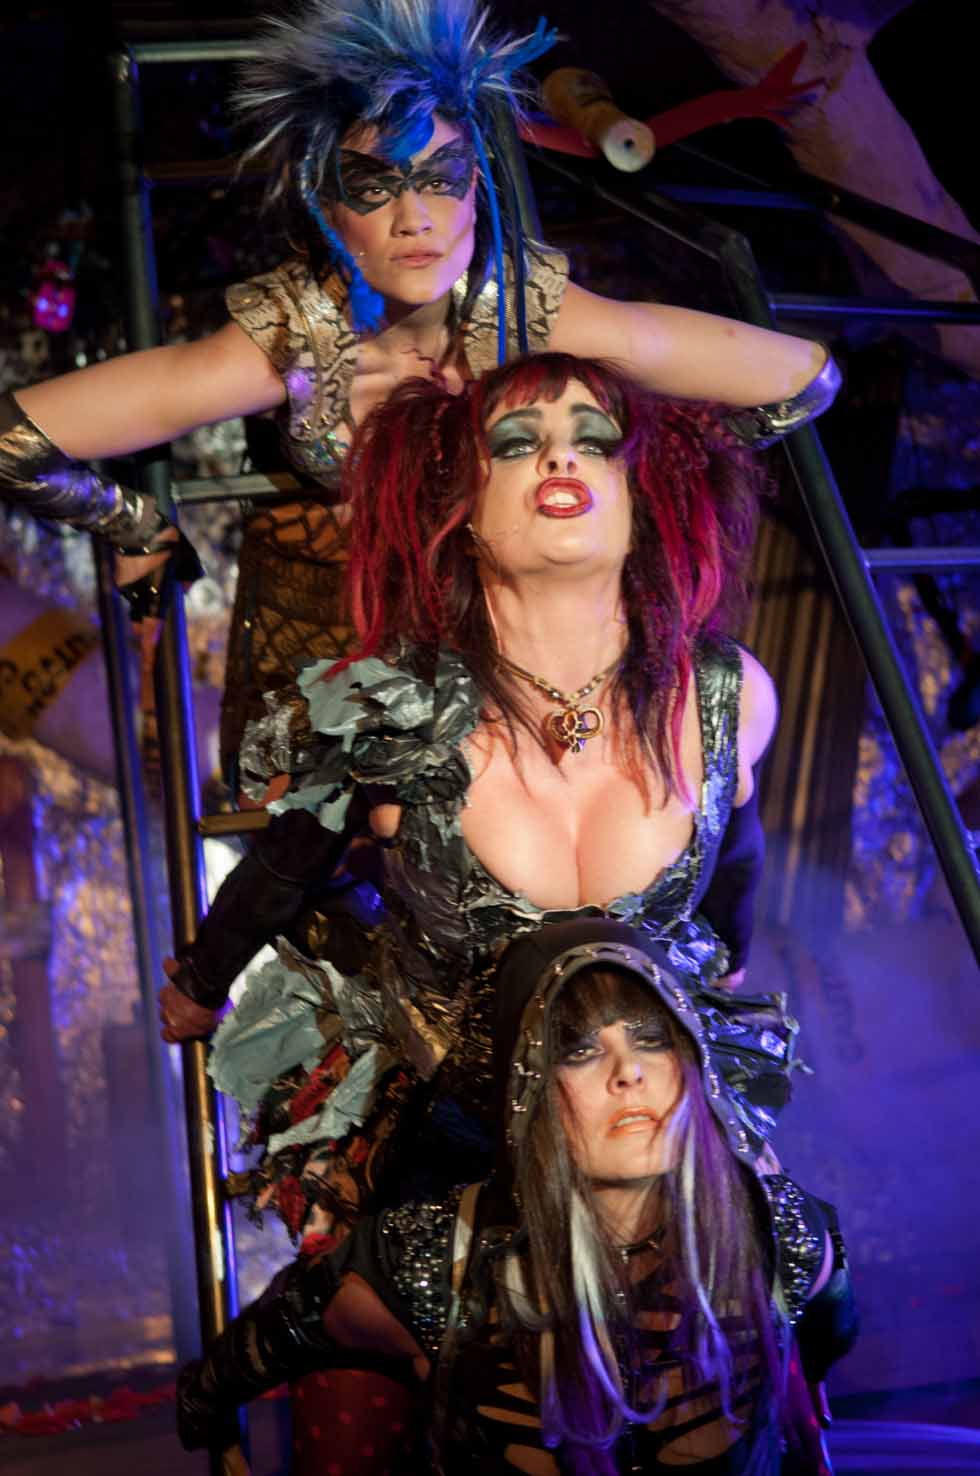 zum-schneider-nyc-2012-karneval-apocalyptika-3442.jpg